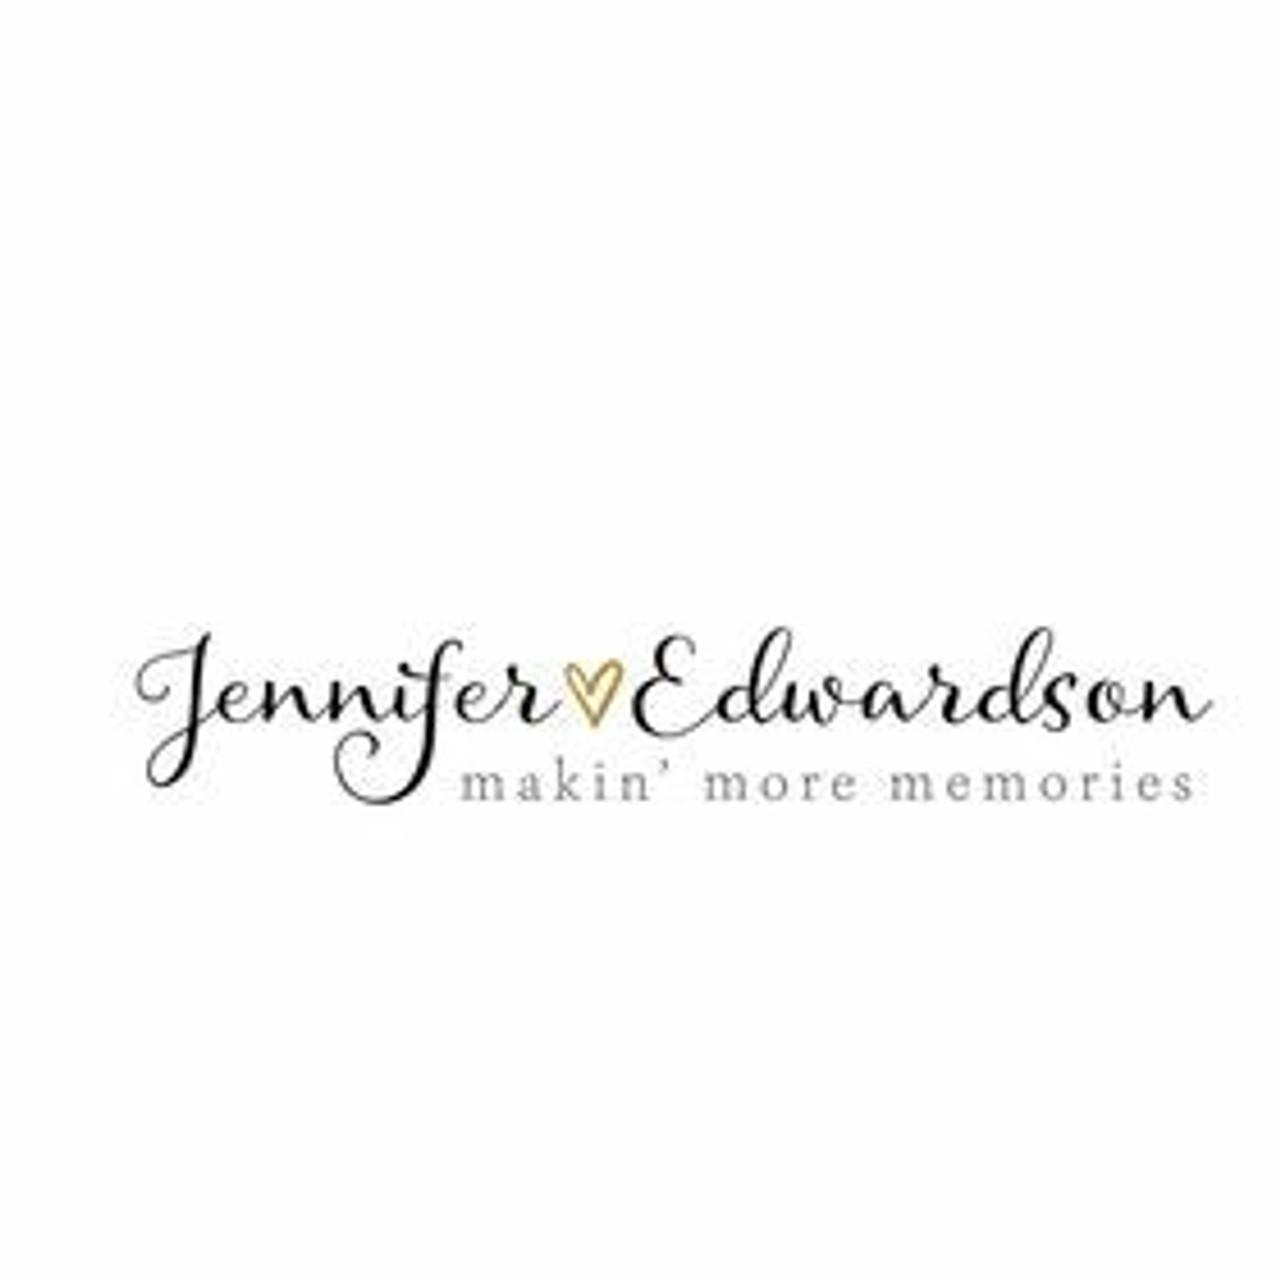 Jennifer Edwardson Creative Kits